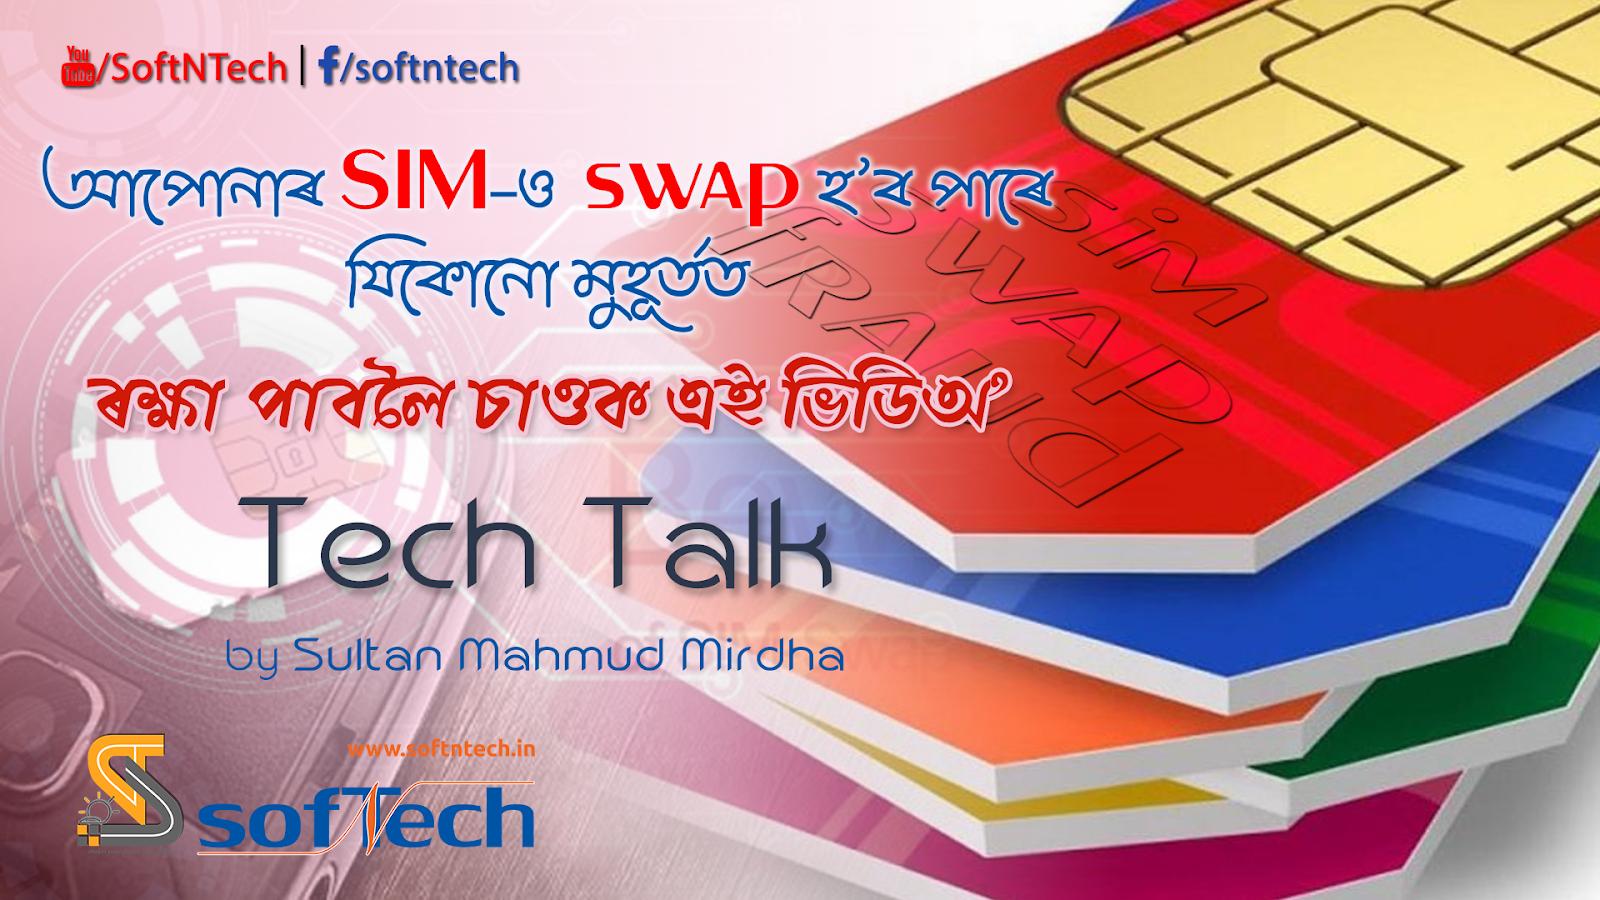 Tech Talk #4 | আপোনাৰ SIM-ও হ'ব পাৰে SWAP যিকোনো মুহূৰ্তত। ৰক্ষা পাবলৈ এইকেইটা কথা মনত ৰাখিব।